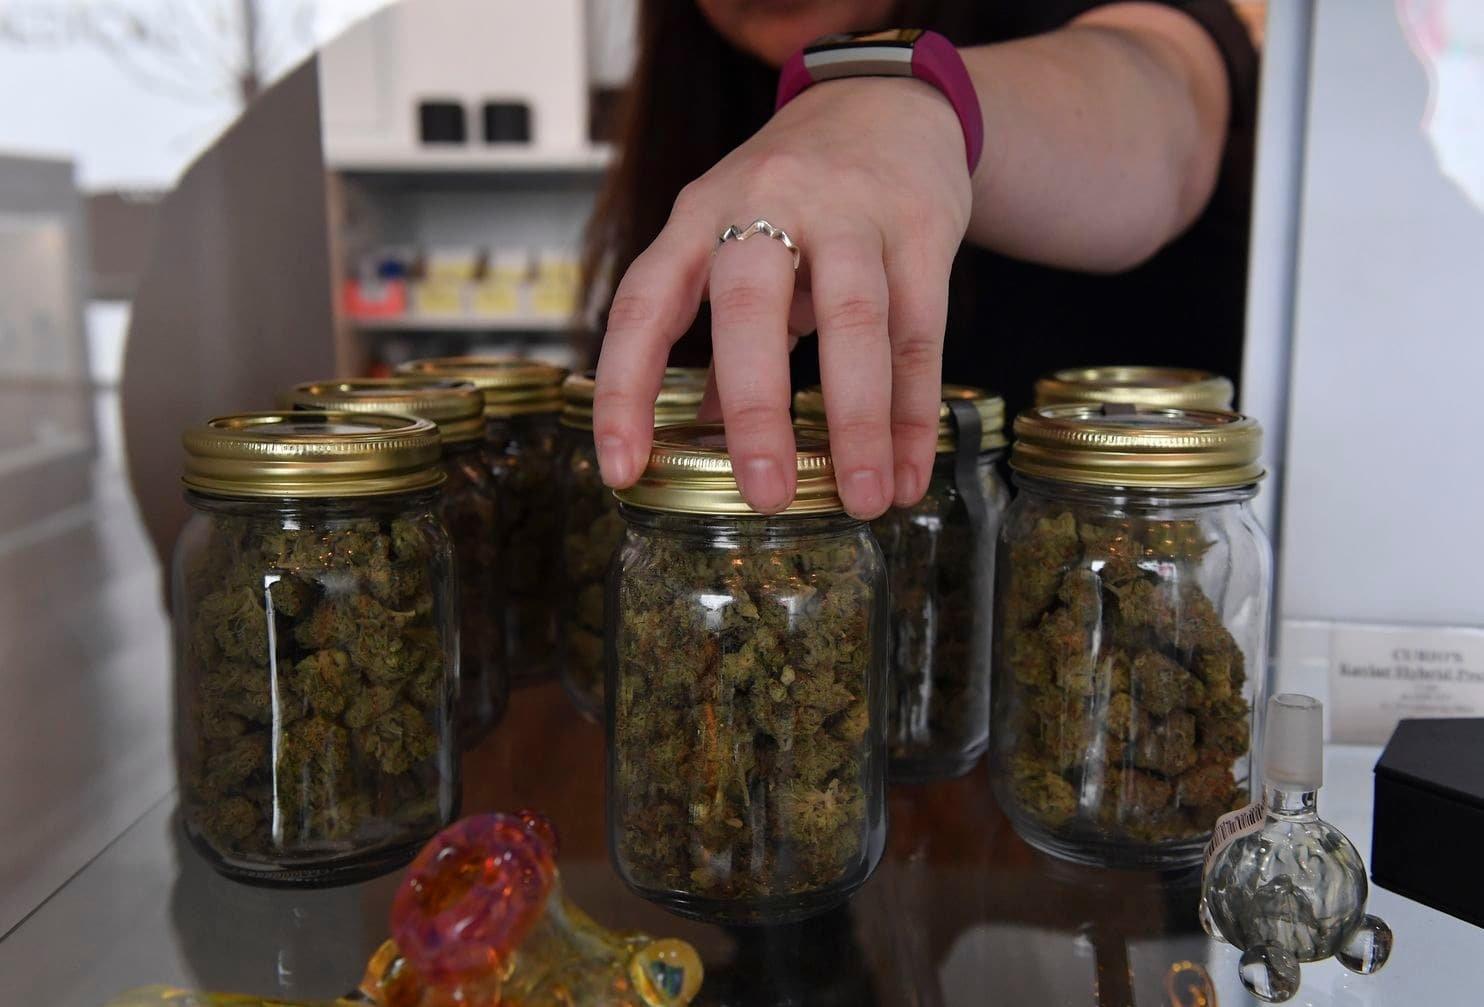 Marijuana education or illegal drug-selling? Instagram's not sure.